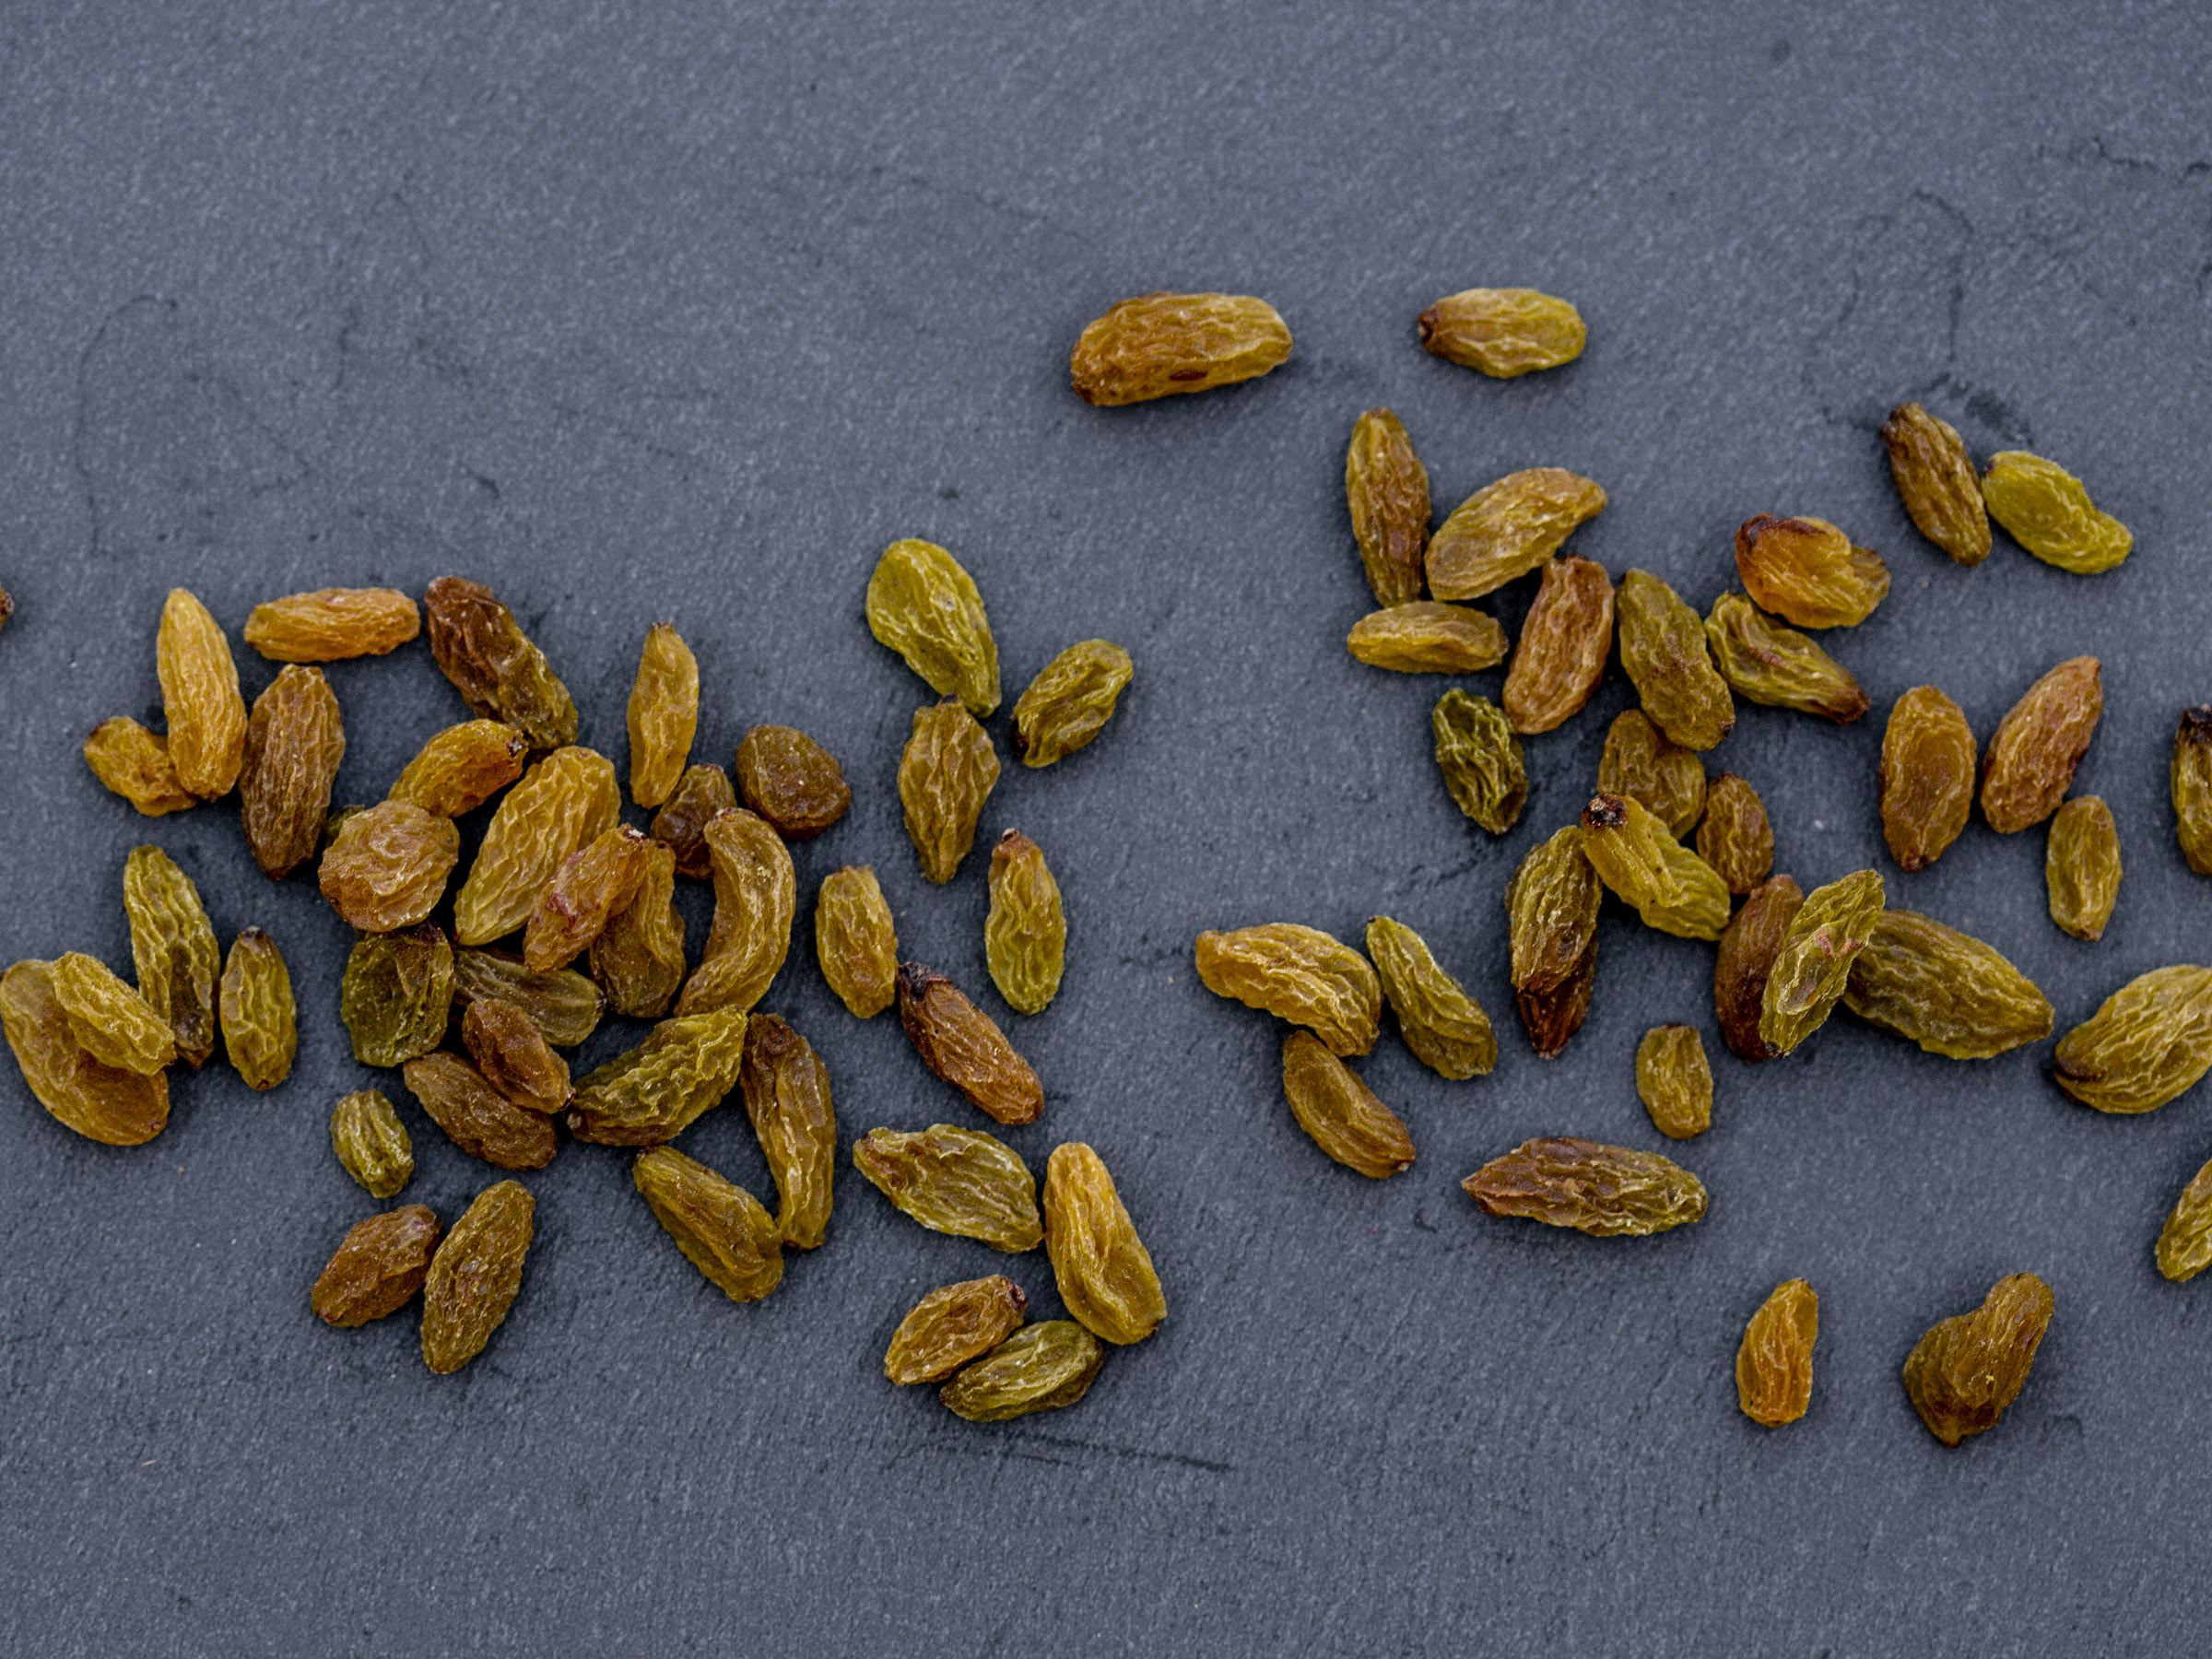 raw raisins and sultanas oil free organic